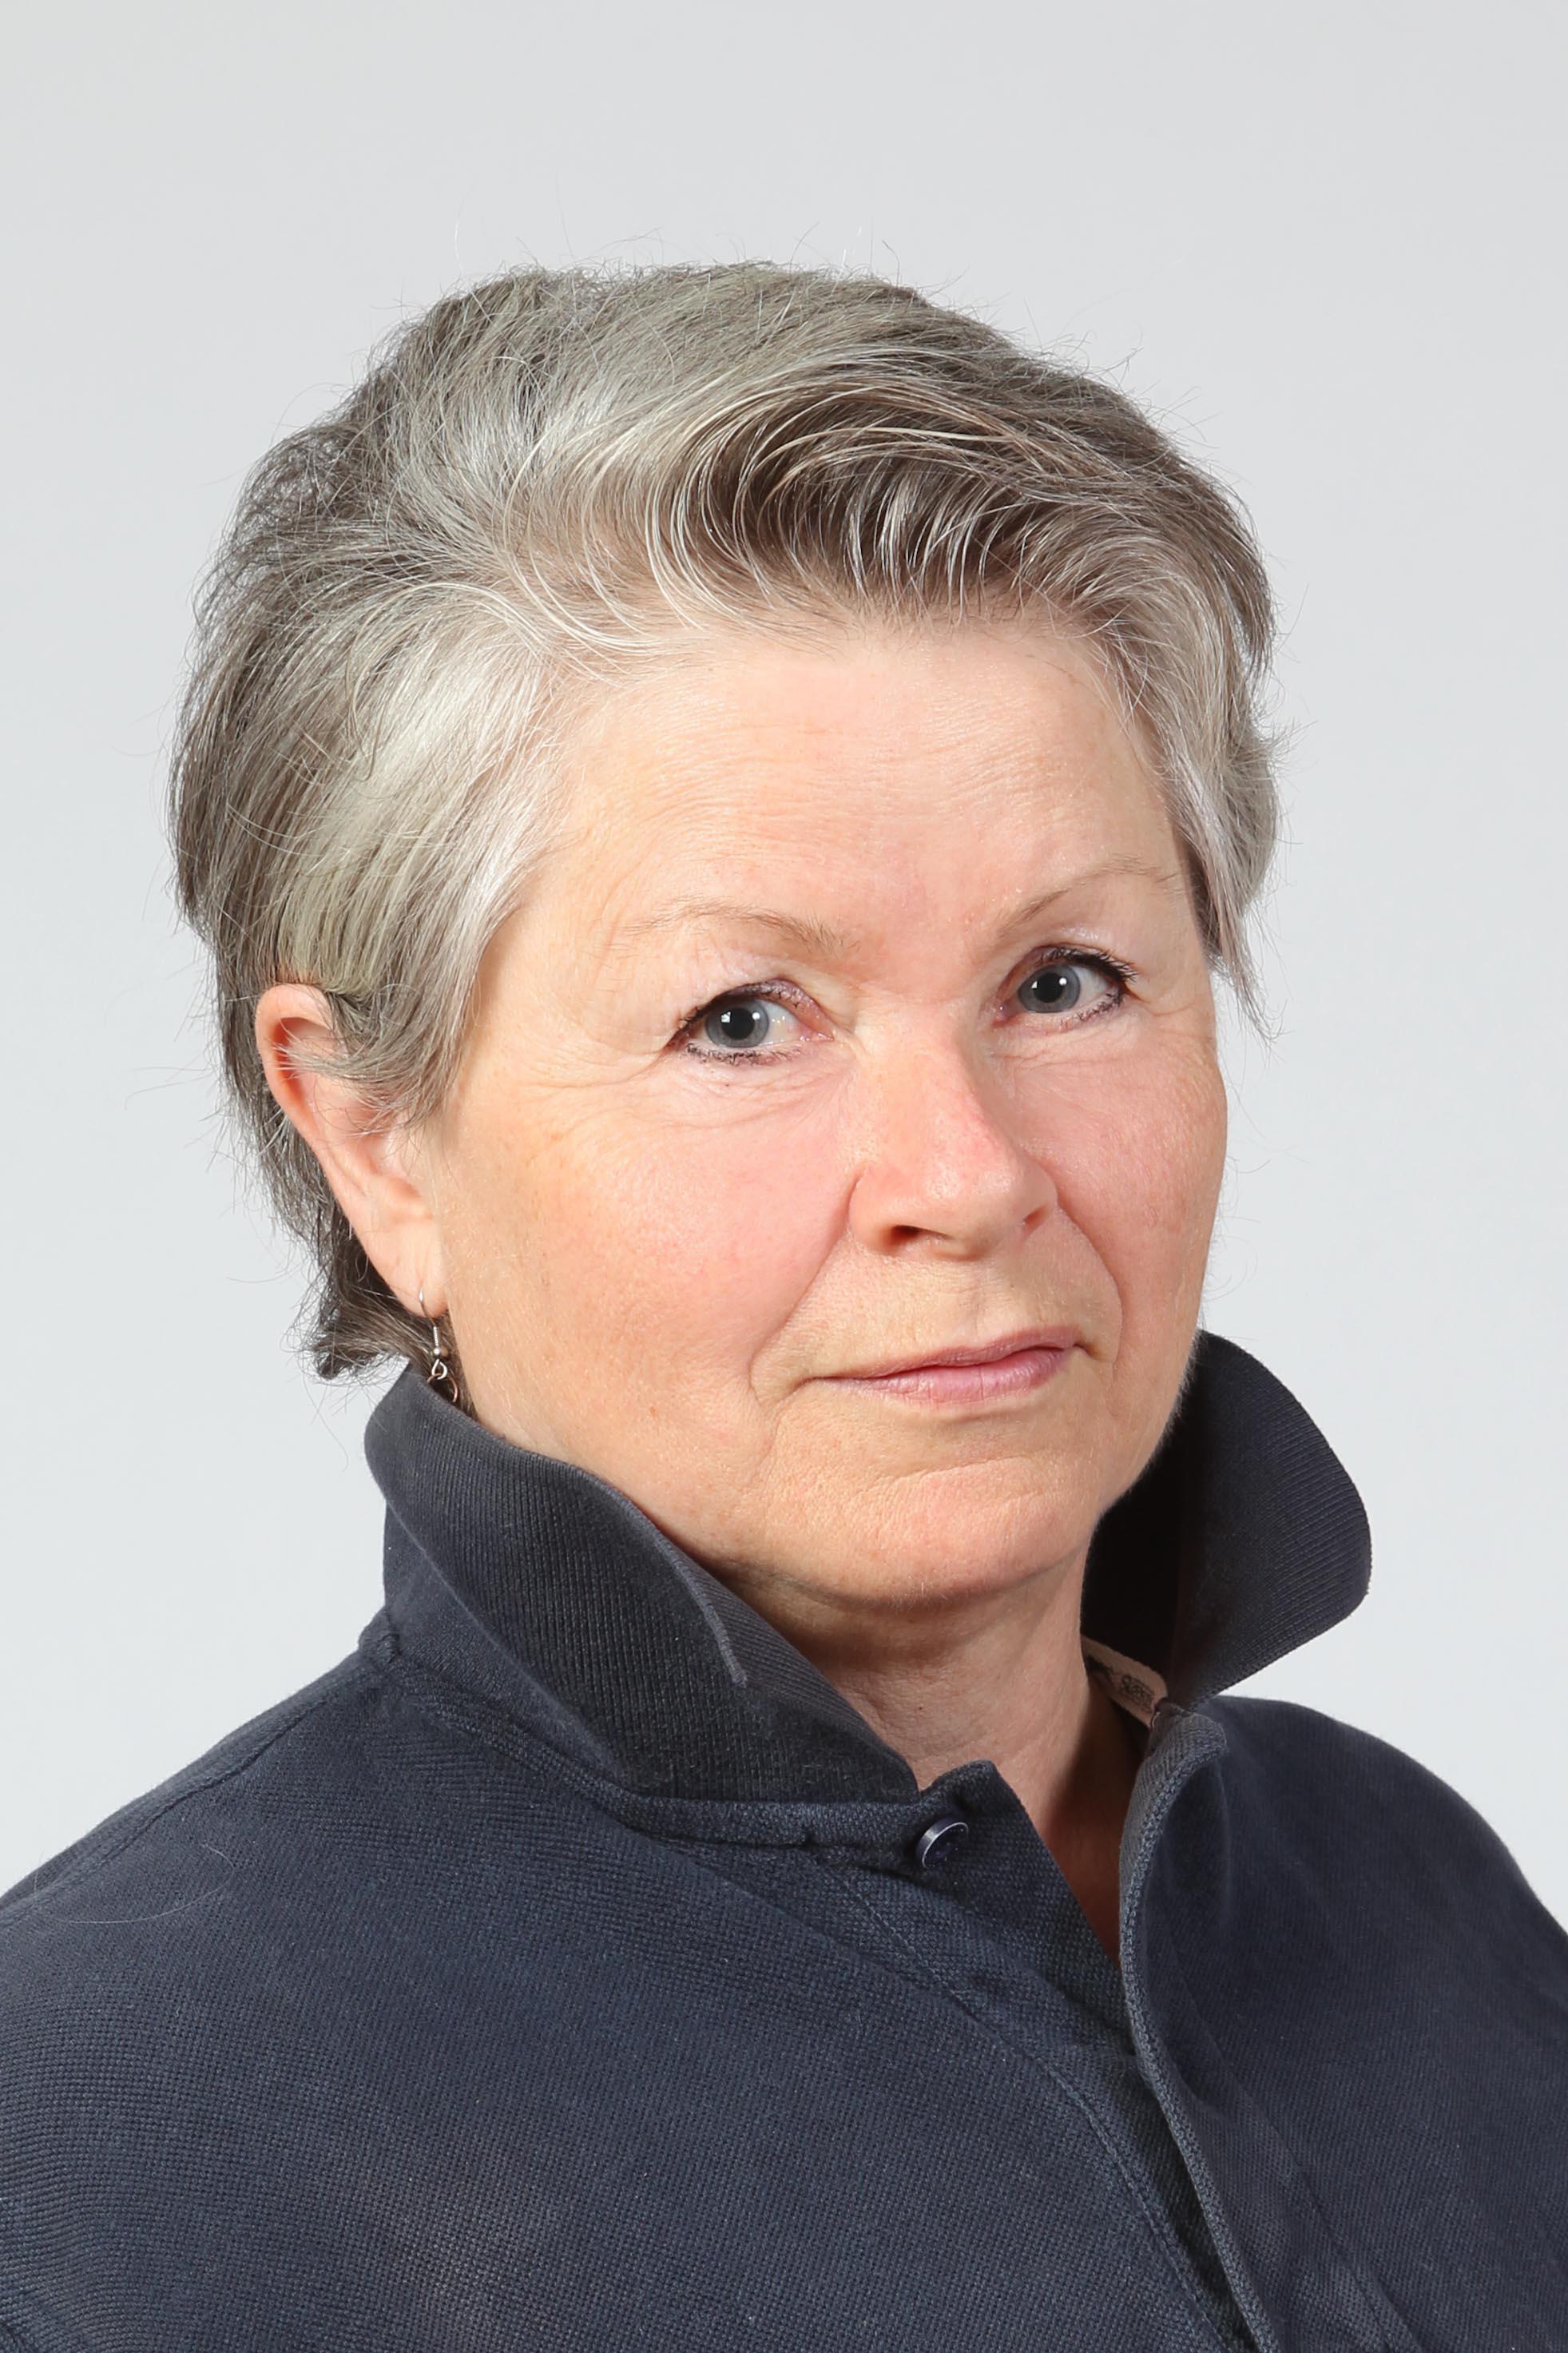 Doris-Maria Heilmann